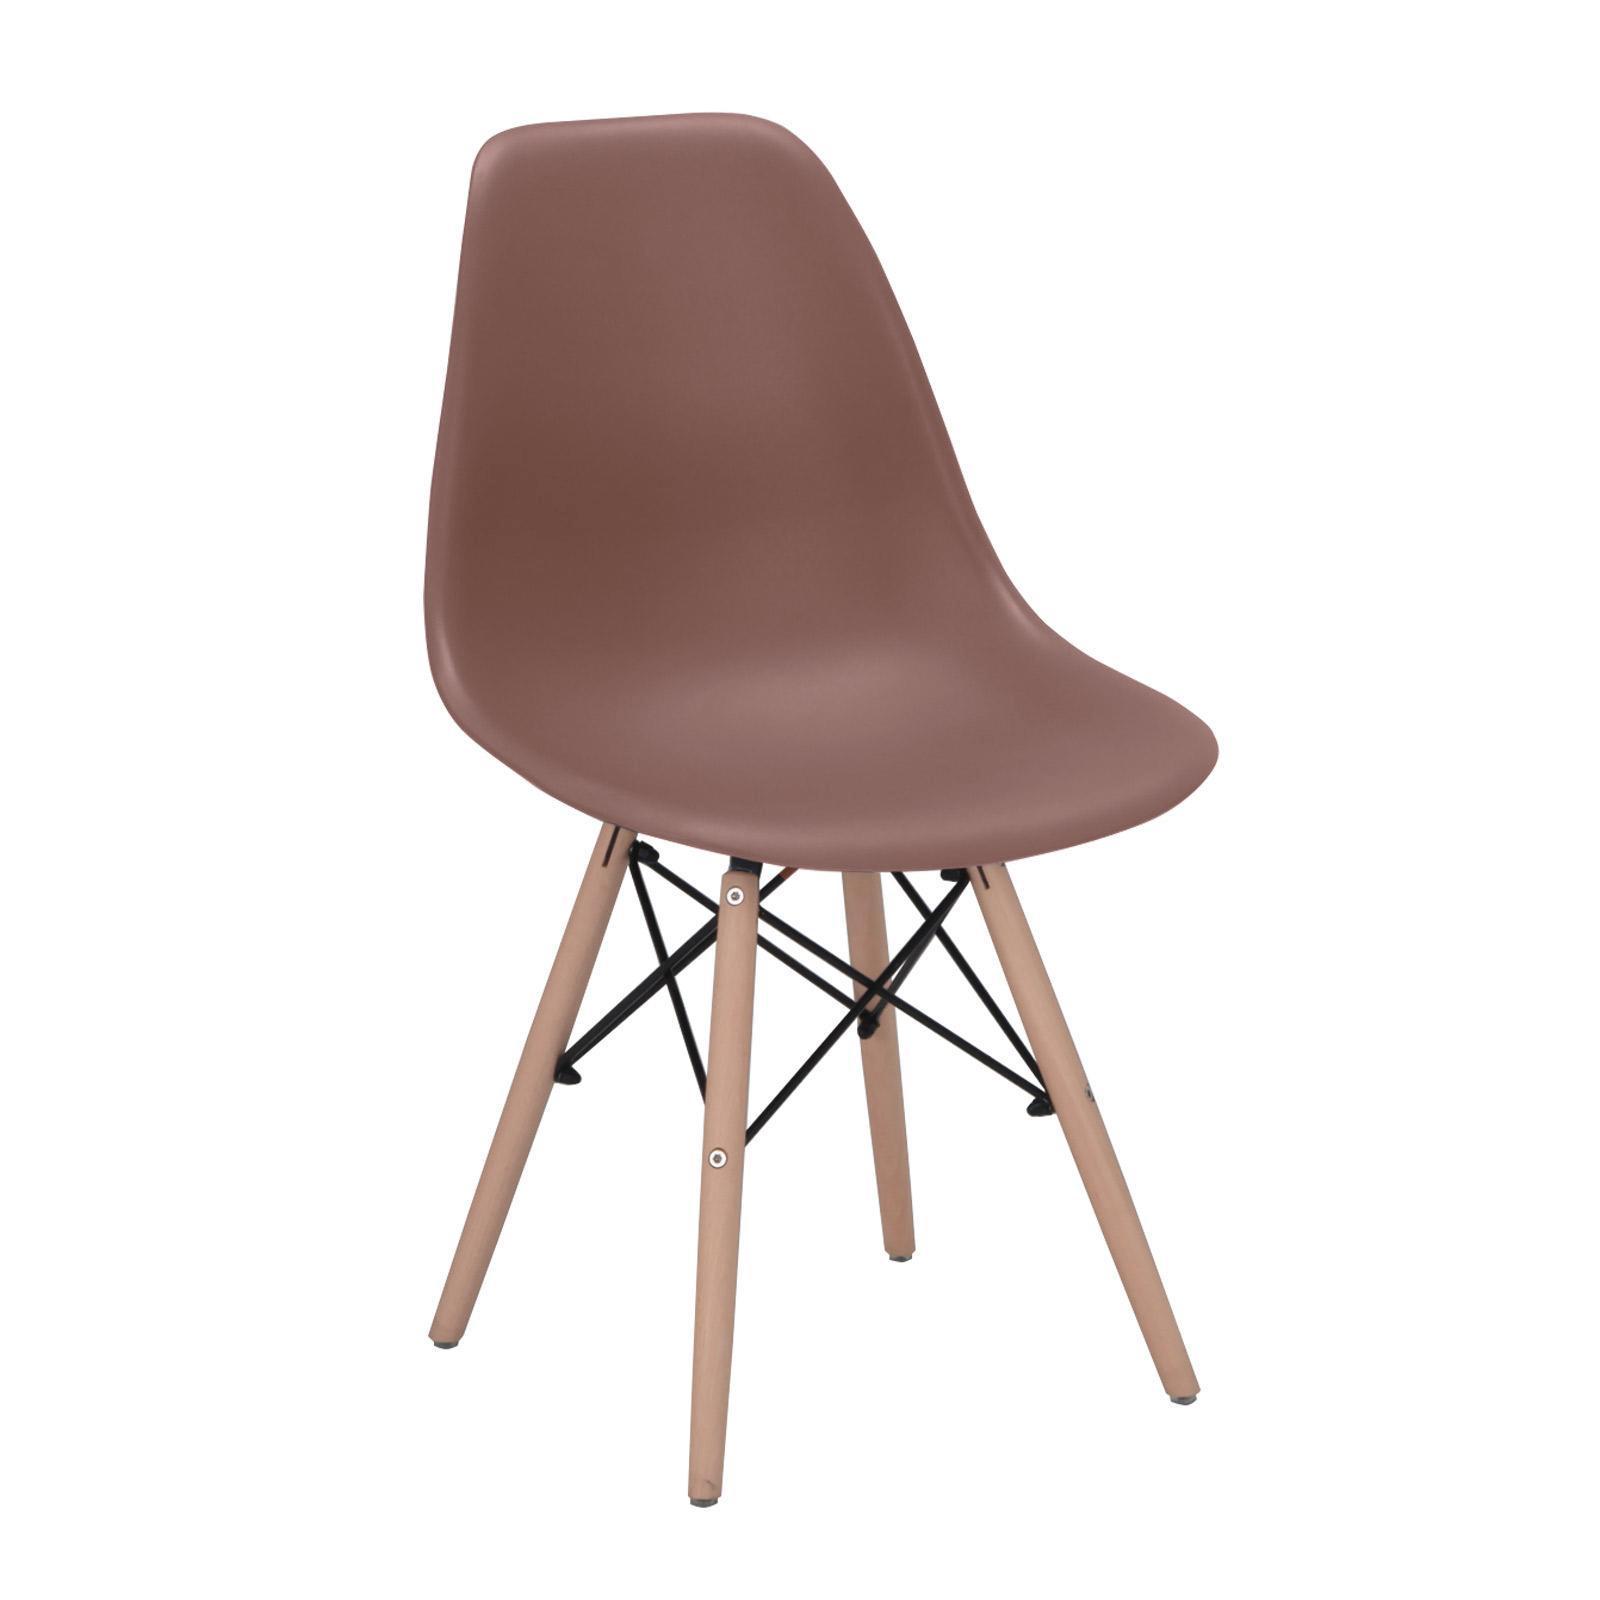 Set 4 sedie stile scandinavo colore marrone taupe con ...